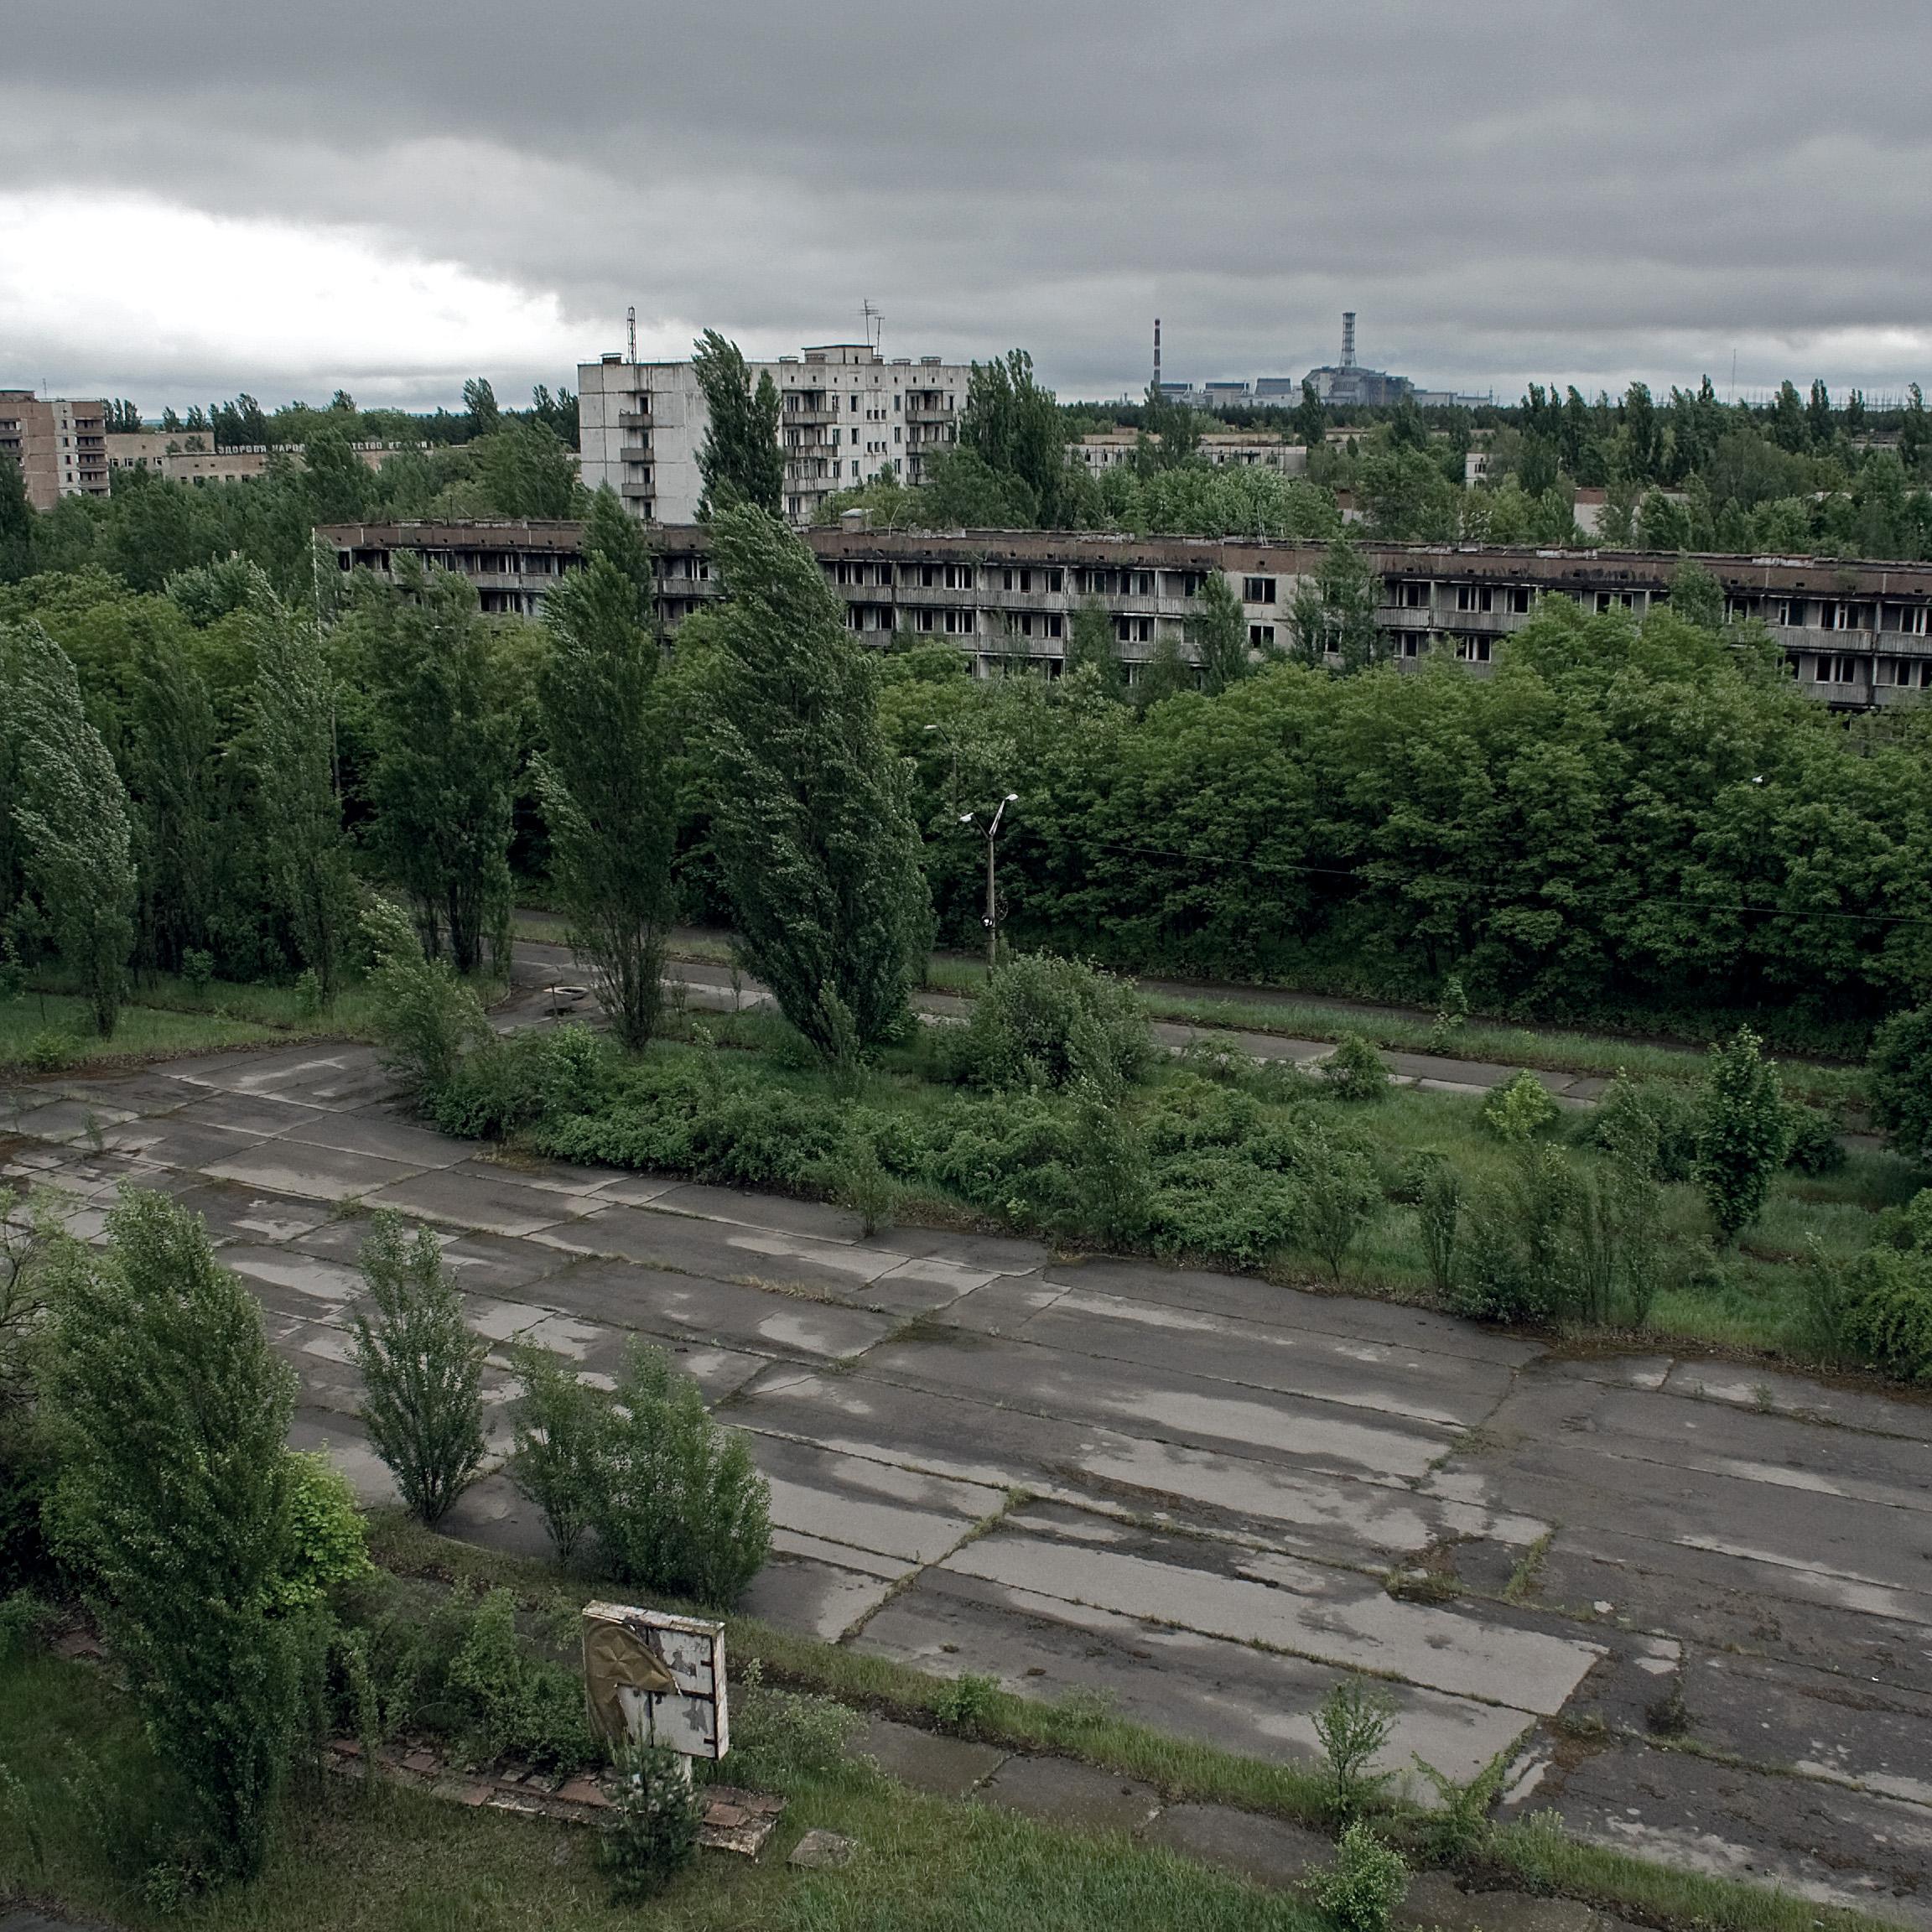 La noche del fin del mundo,reportaje de Chernobyl de Iker Jimenez ...